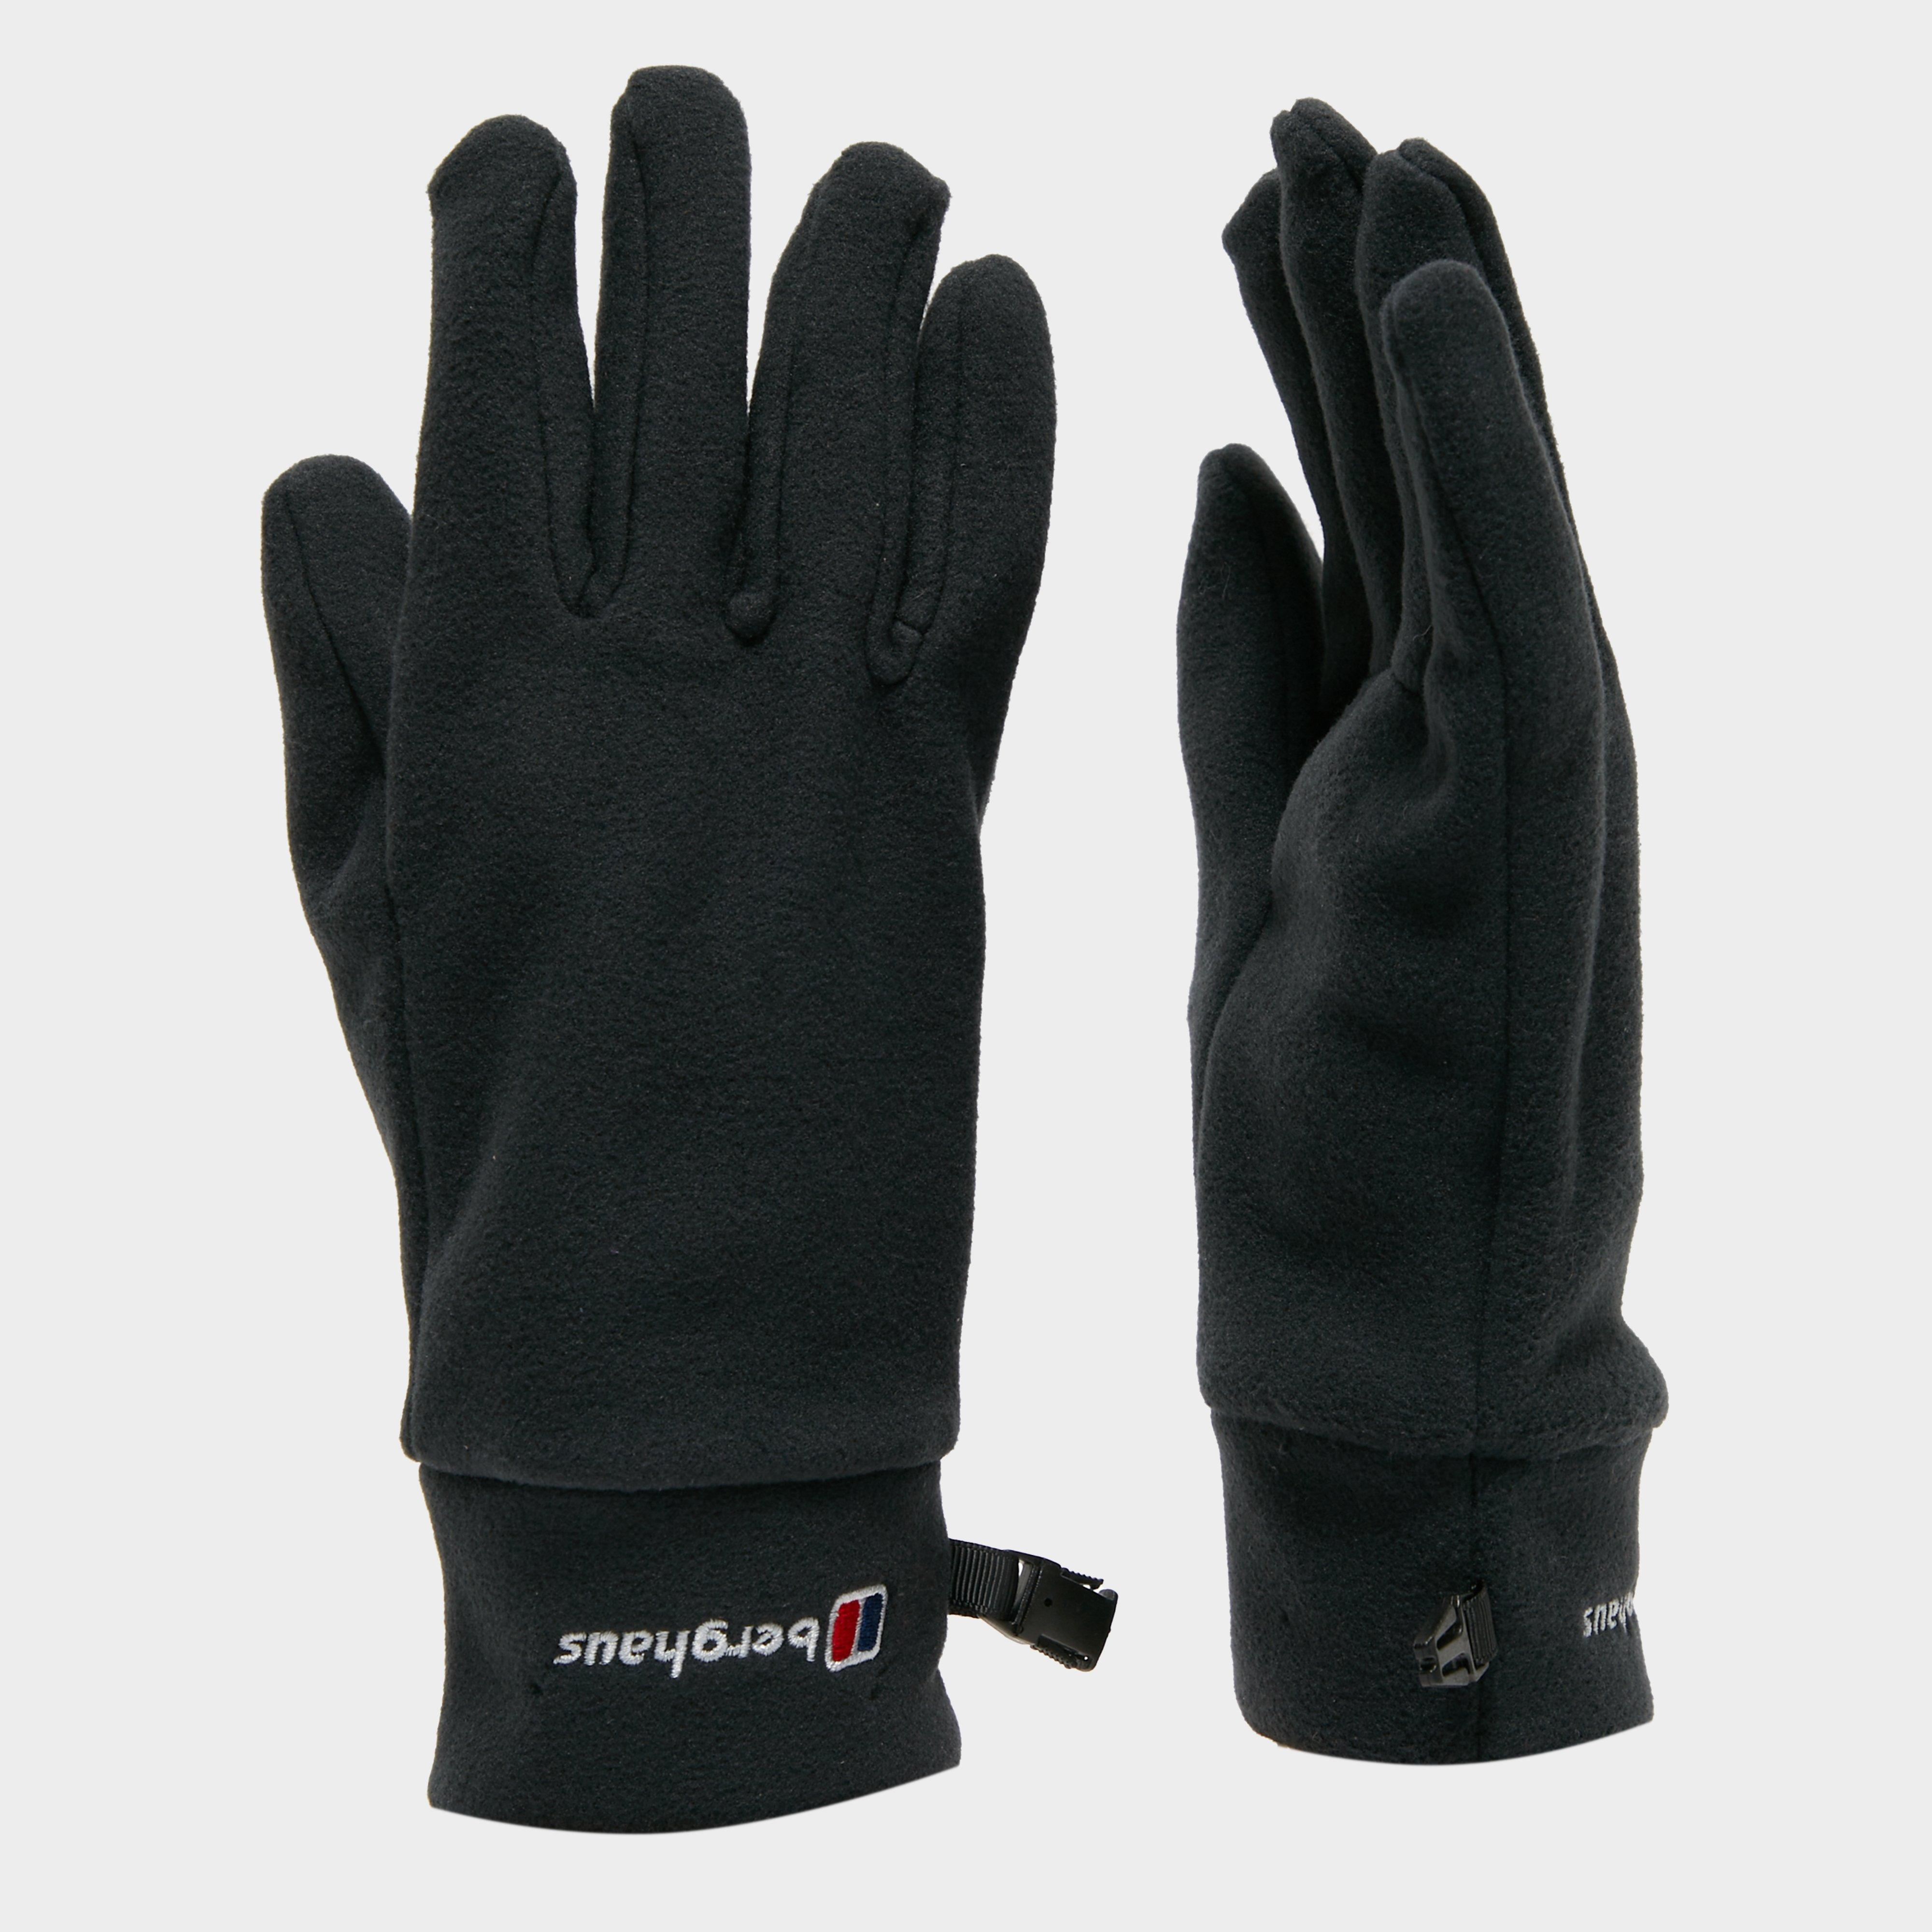 Berghaus Unisex Spectrum Glove - Black, Black